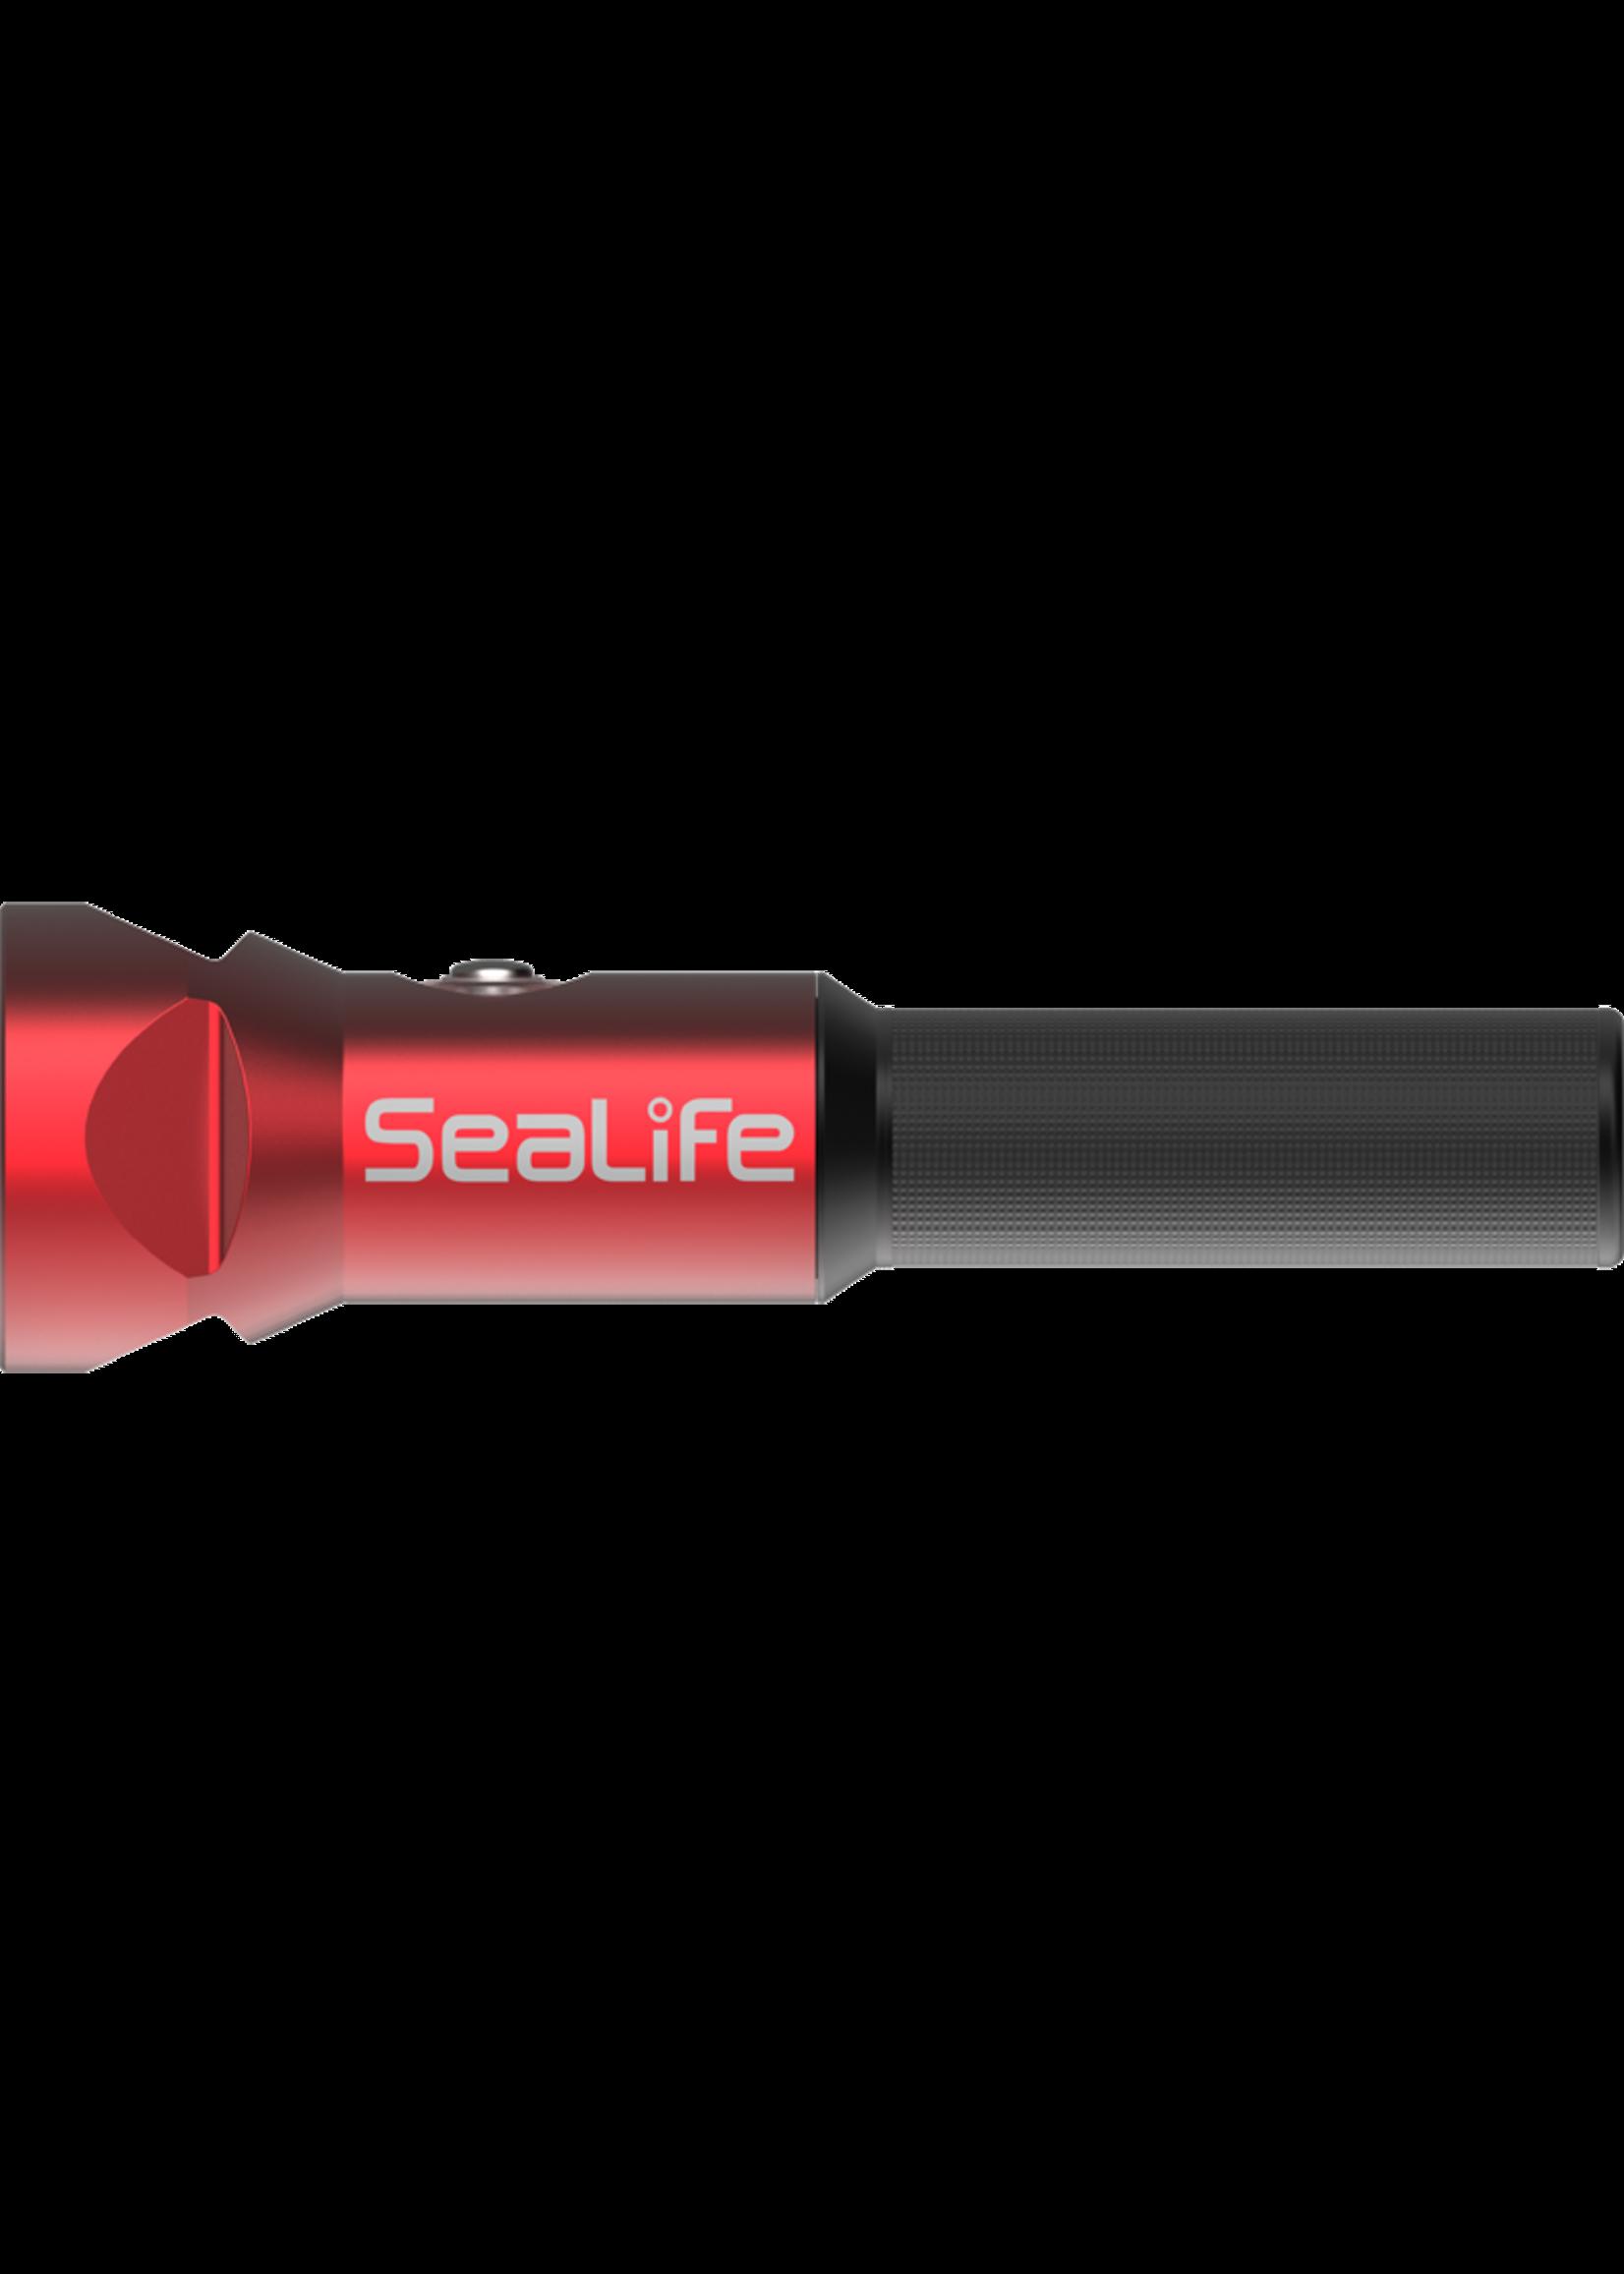 Sealife Sea Dragon 1300